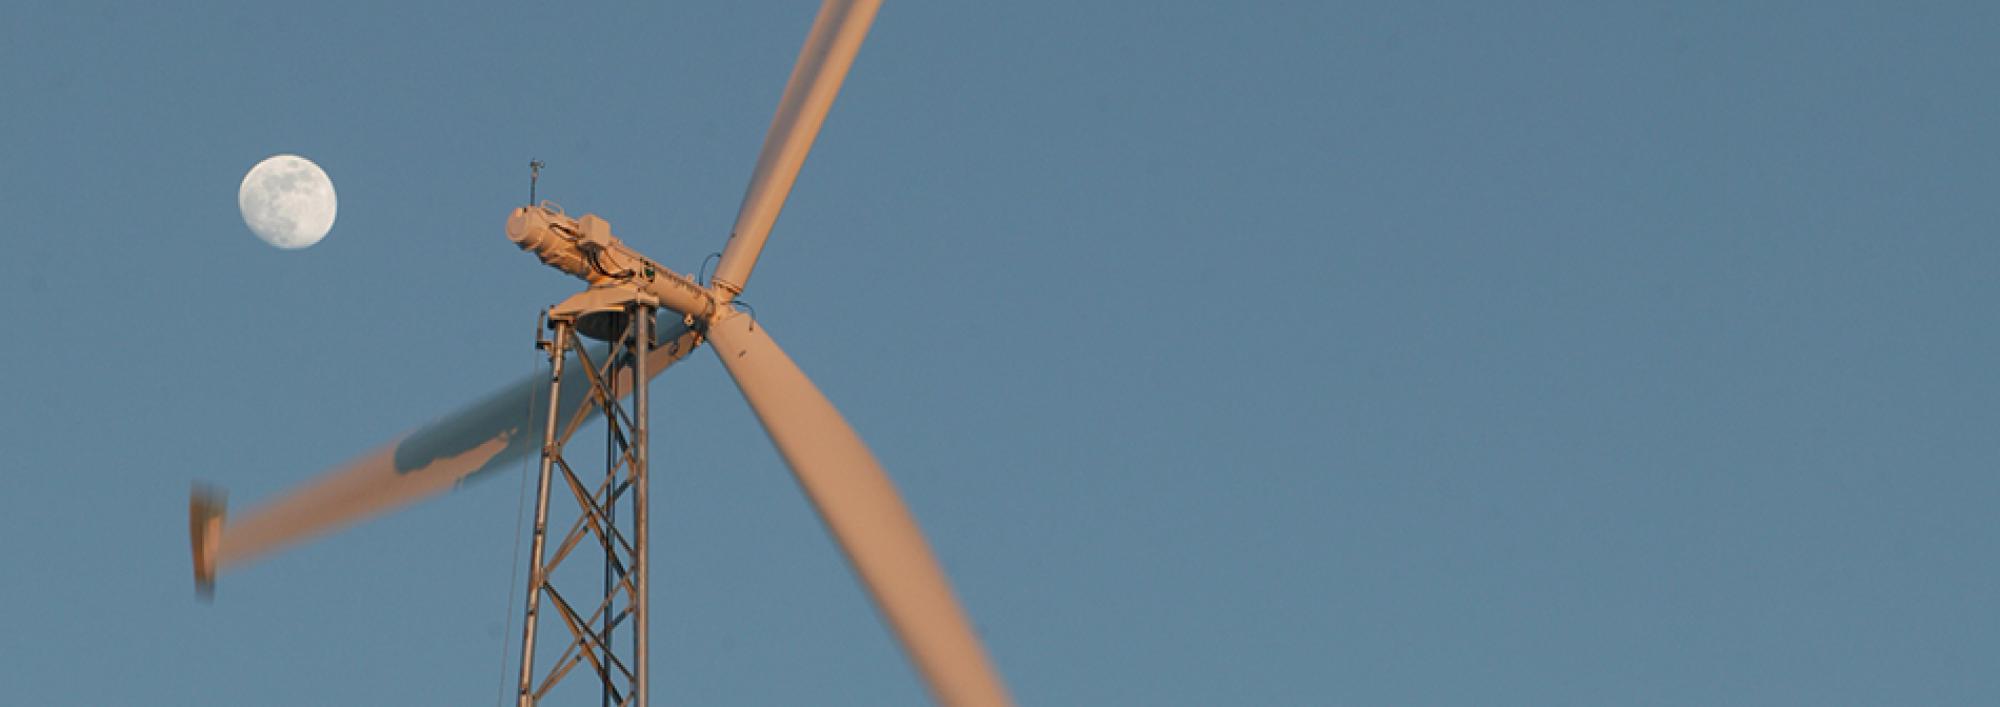 Windmill against a blue sky